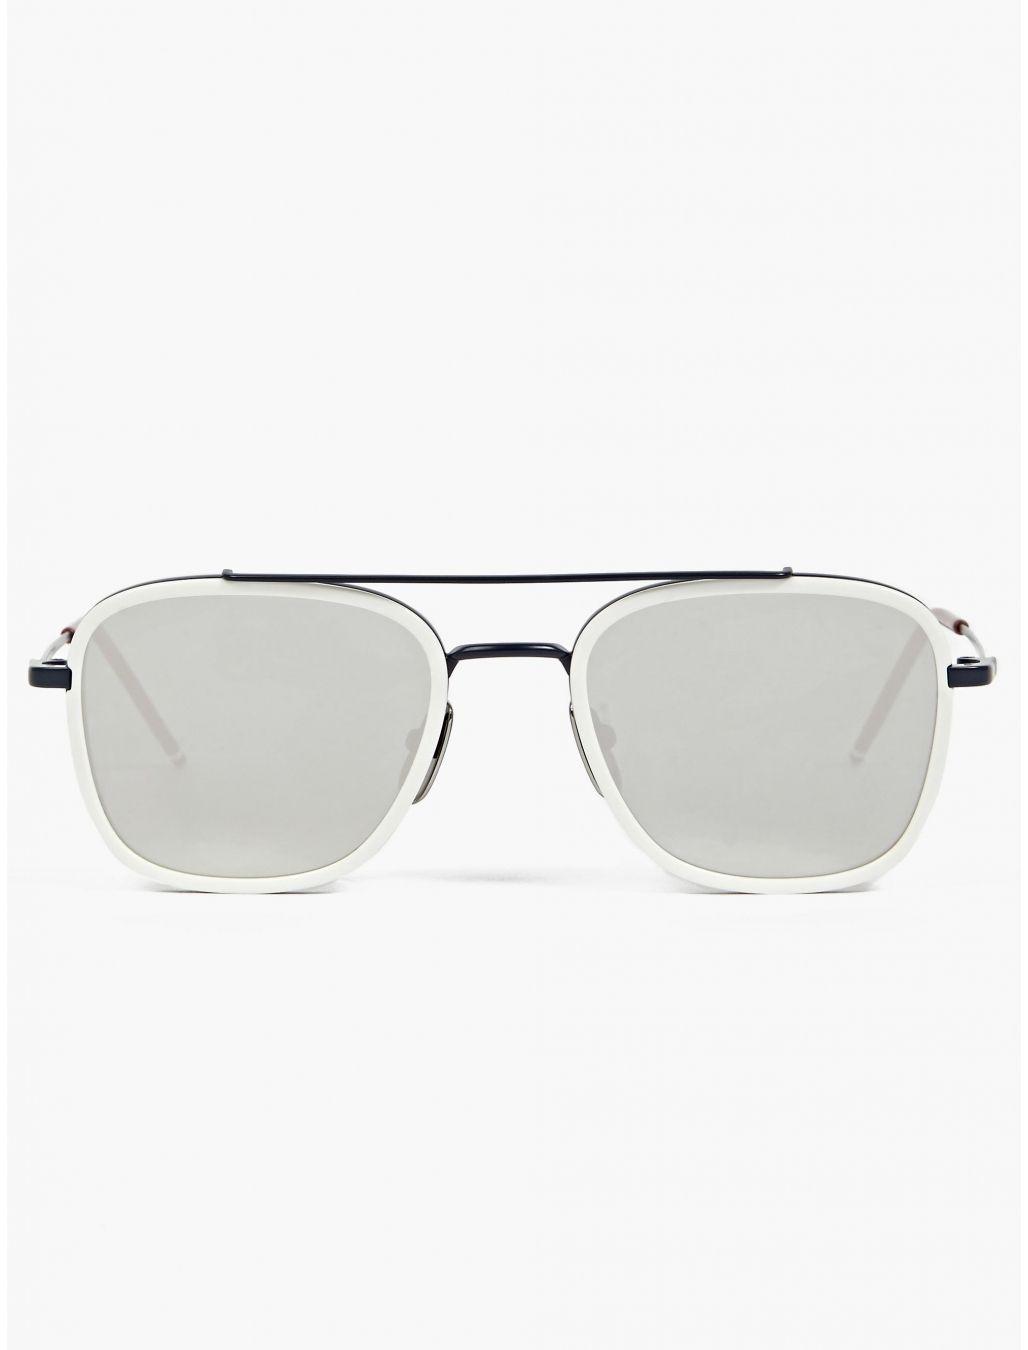 fb3212a162a2 Thom Browne Men s White TB-800-D Silver Lens Sunglasses